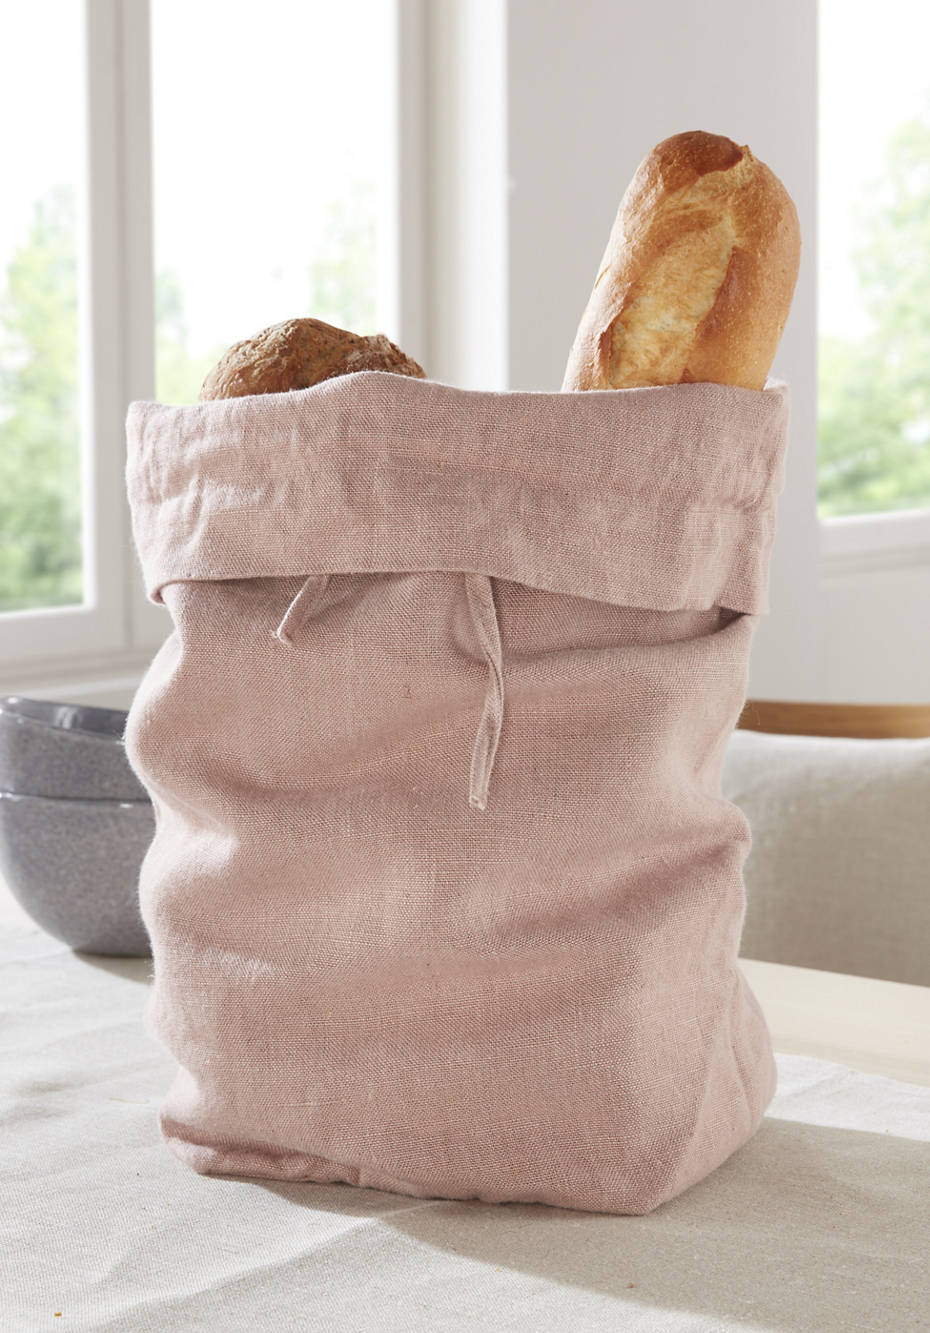 Brotbeutel aus Hessen-Leinen